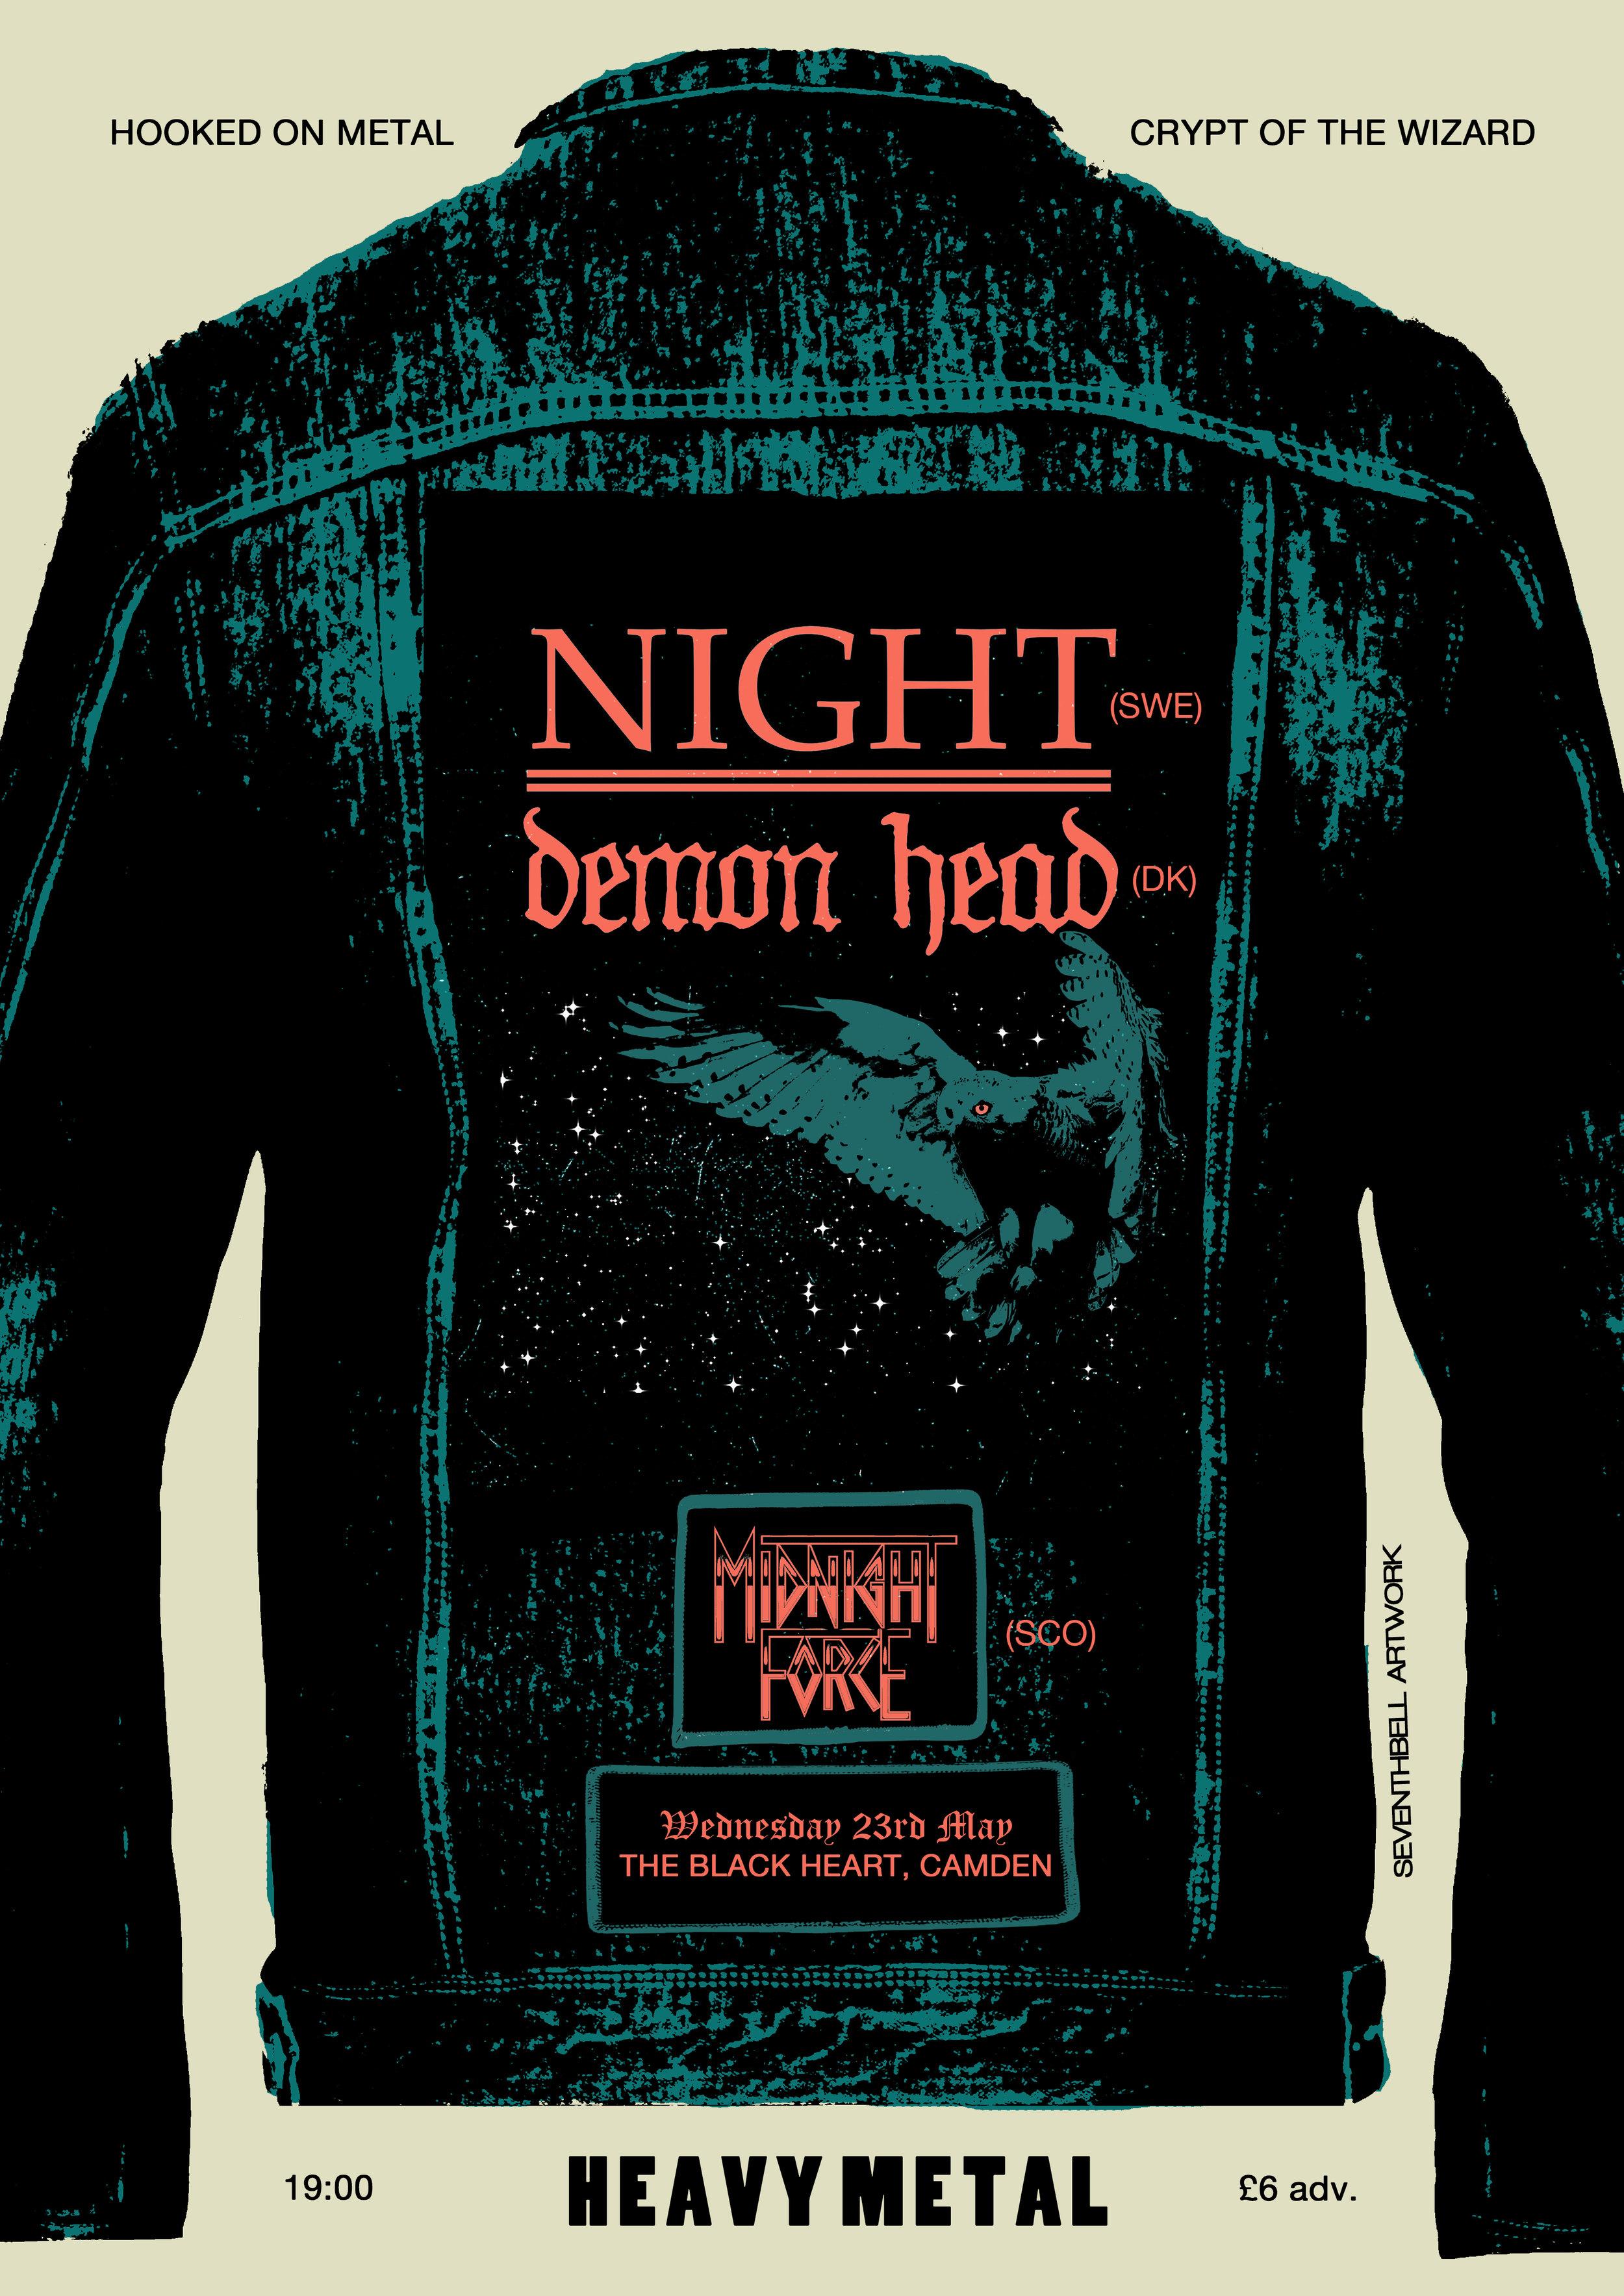 Night_DemonHead_poster2.jpg